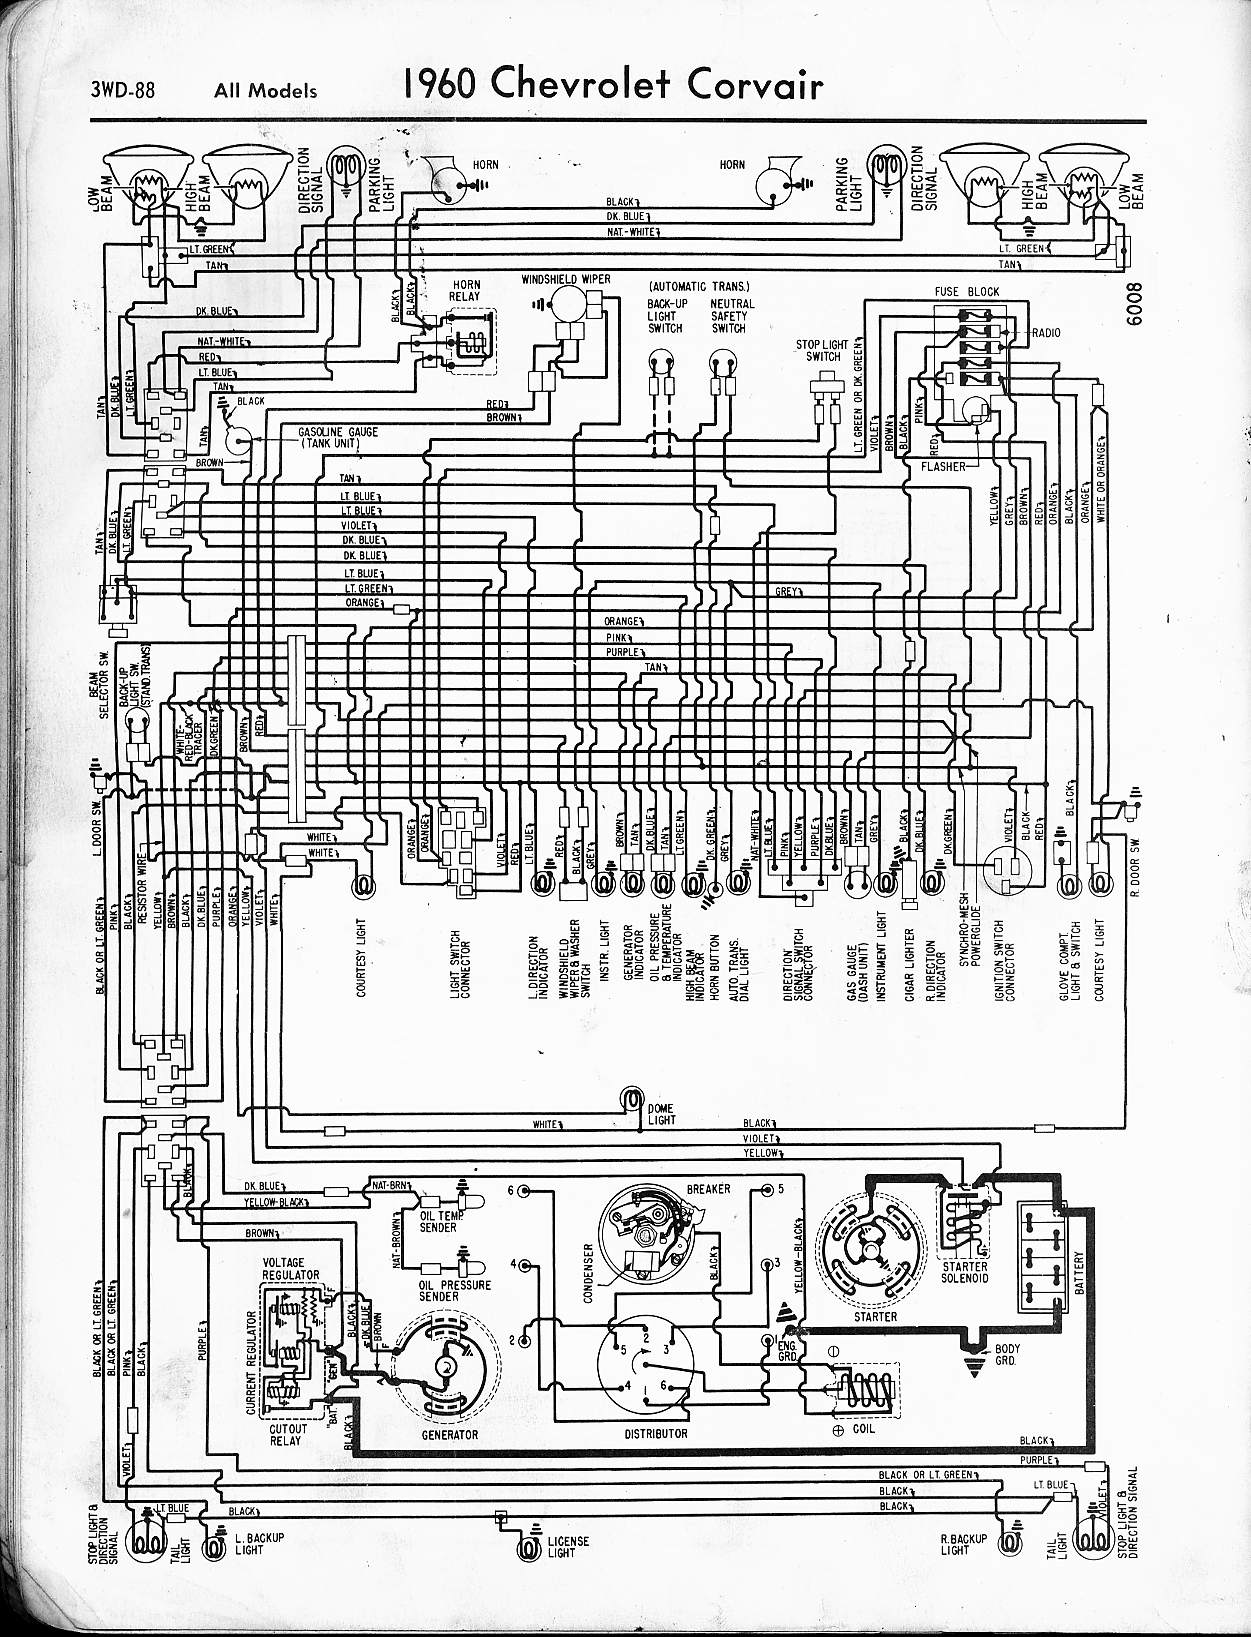 hight resolution of 1960 corvette wiring diagram wiring diagrams img 1963  corvair wiring diagram 1960 corvette